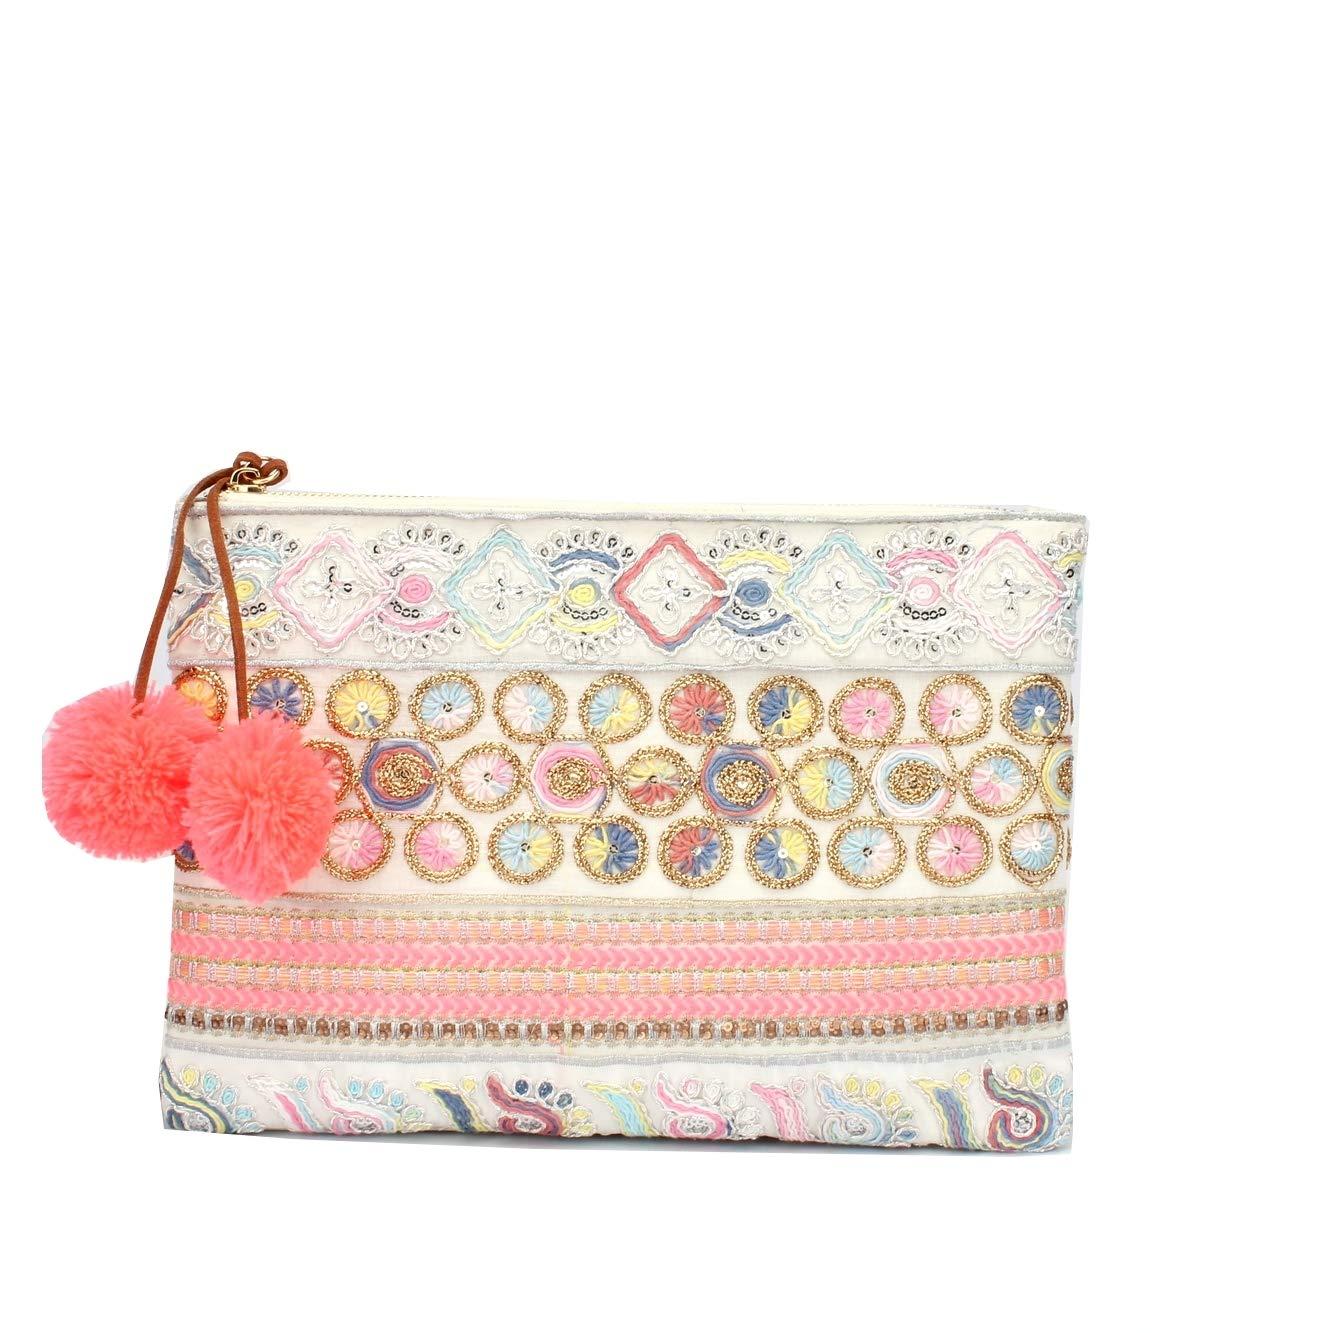 Angkorly Bolsa de mano Envelope Clutches de mano Mini crossbody Tote bag azteca Perla Pompom rom/ántico Folk//Etnico Bohemia para bodas y fiestas mujer elegante de de moda idea de regalo